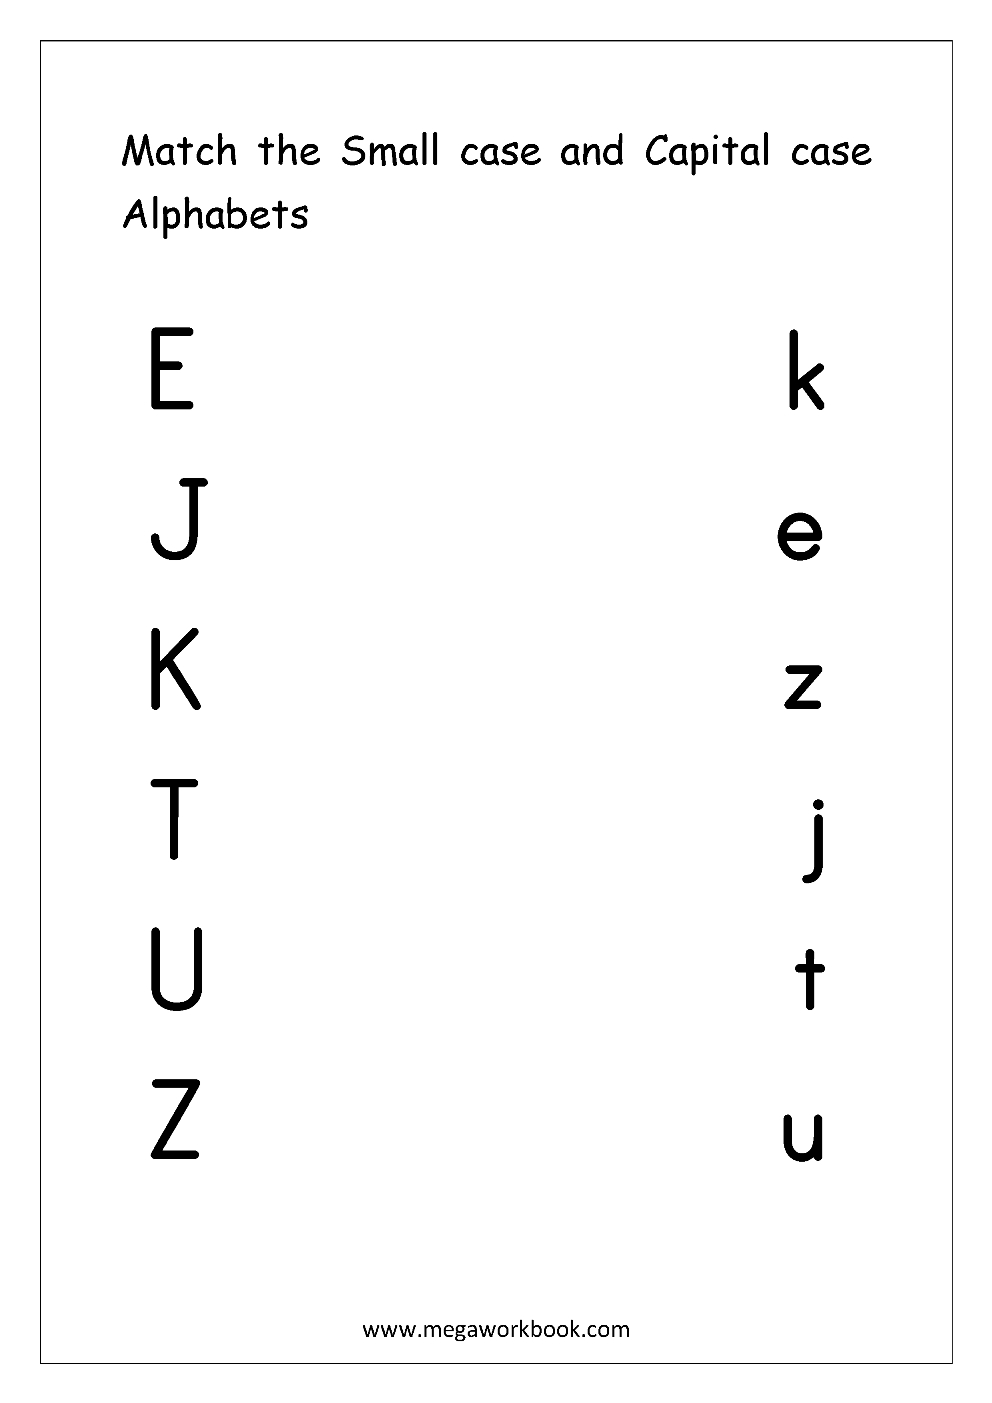 Free English Worksheets - Alphabet Matching - Megaworkbook pertaining to Alphabet Matching Worksheets For Kindergarten